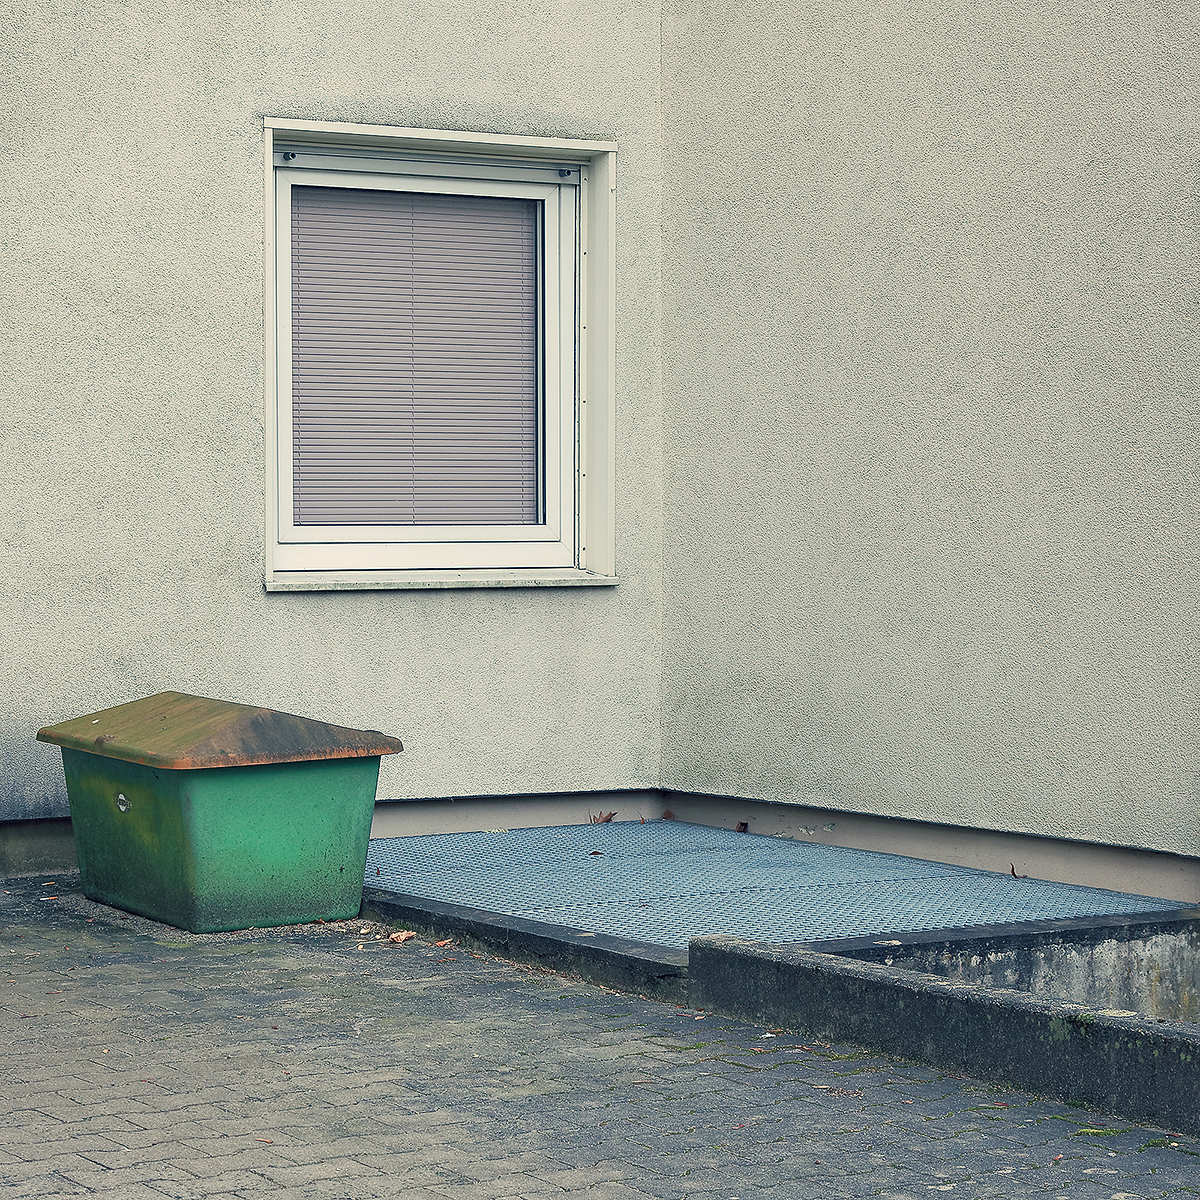 PeterBraunholz_Ecken(Corners)_Ecke06.jpg